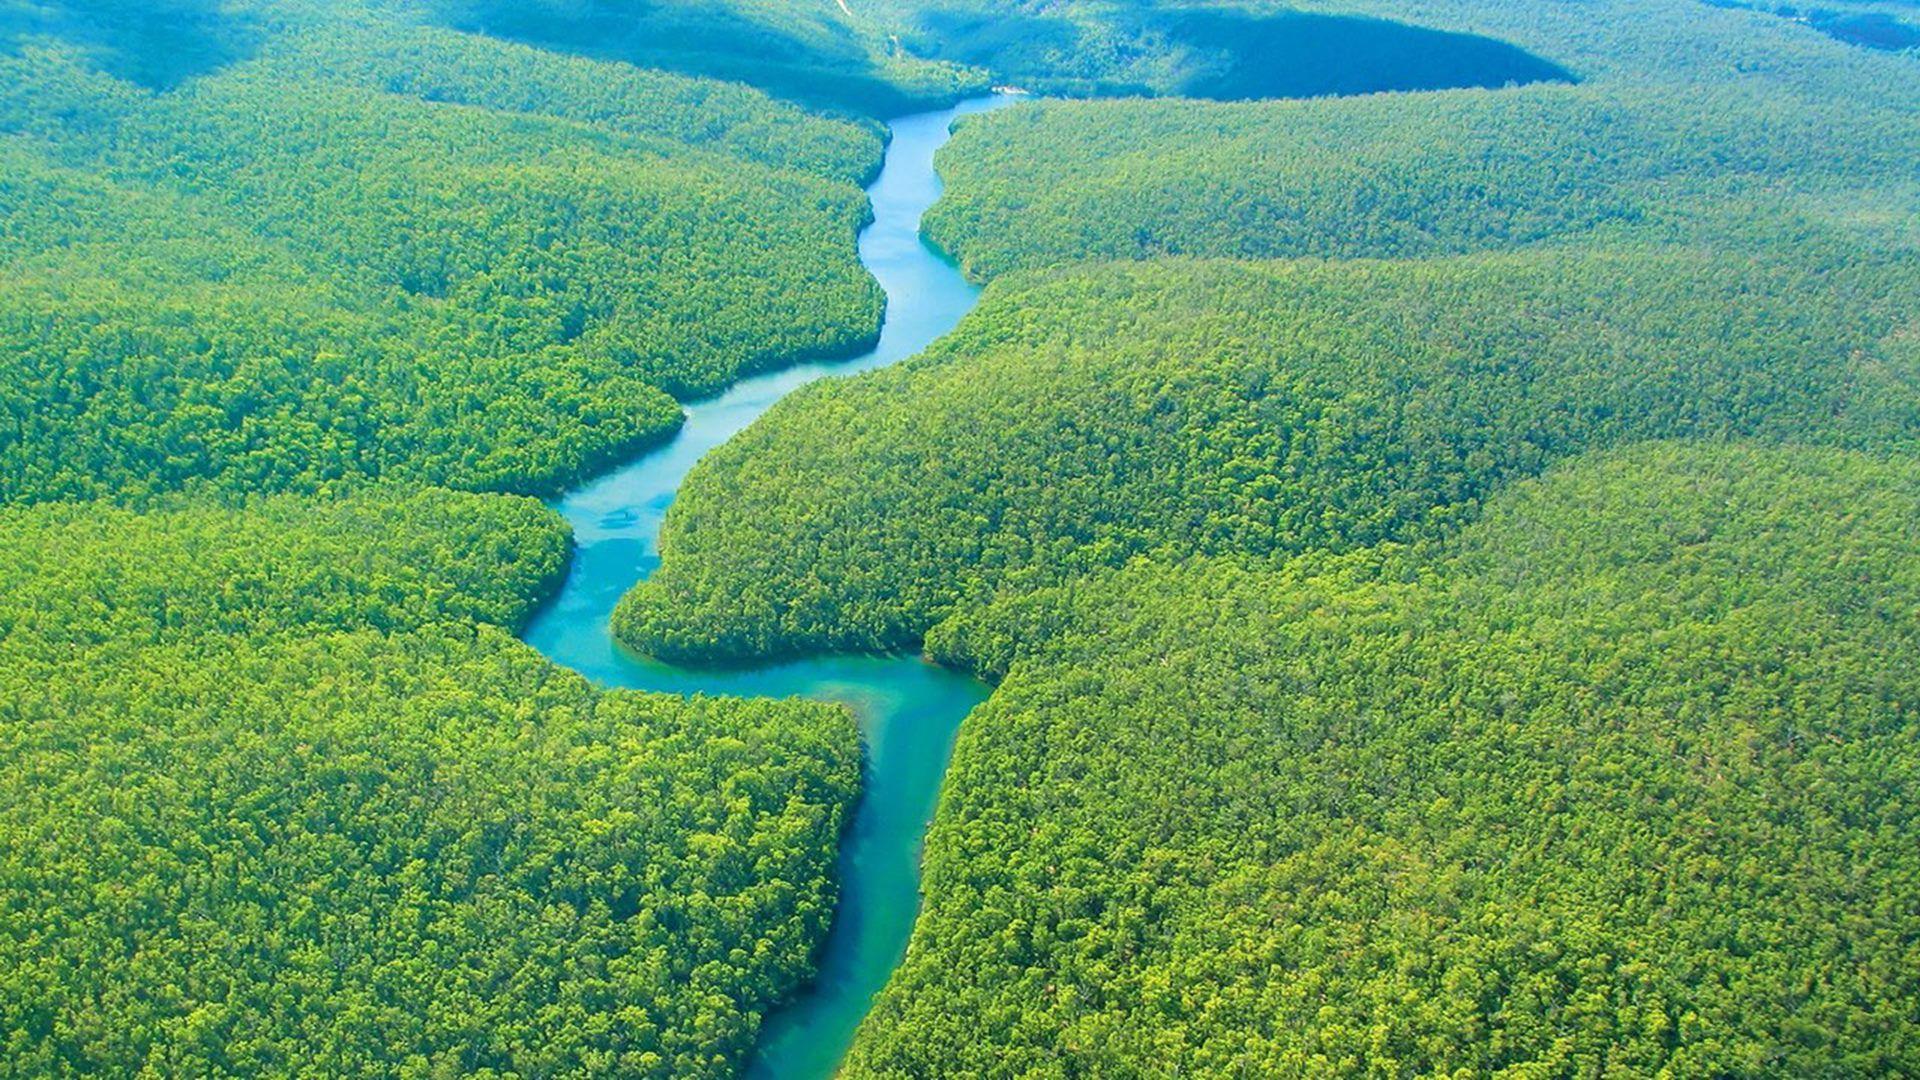 Amazon Rainforest HD Wallpapers - Wallpaper Cave